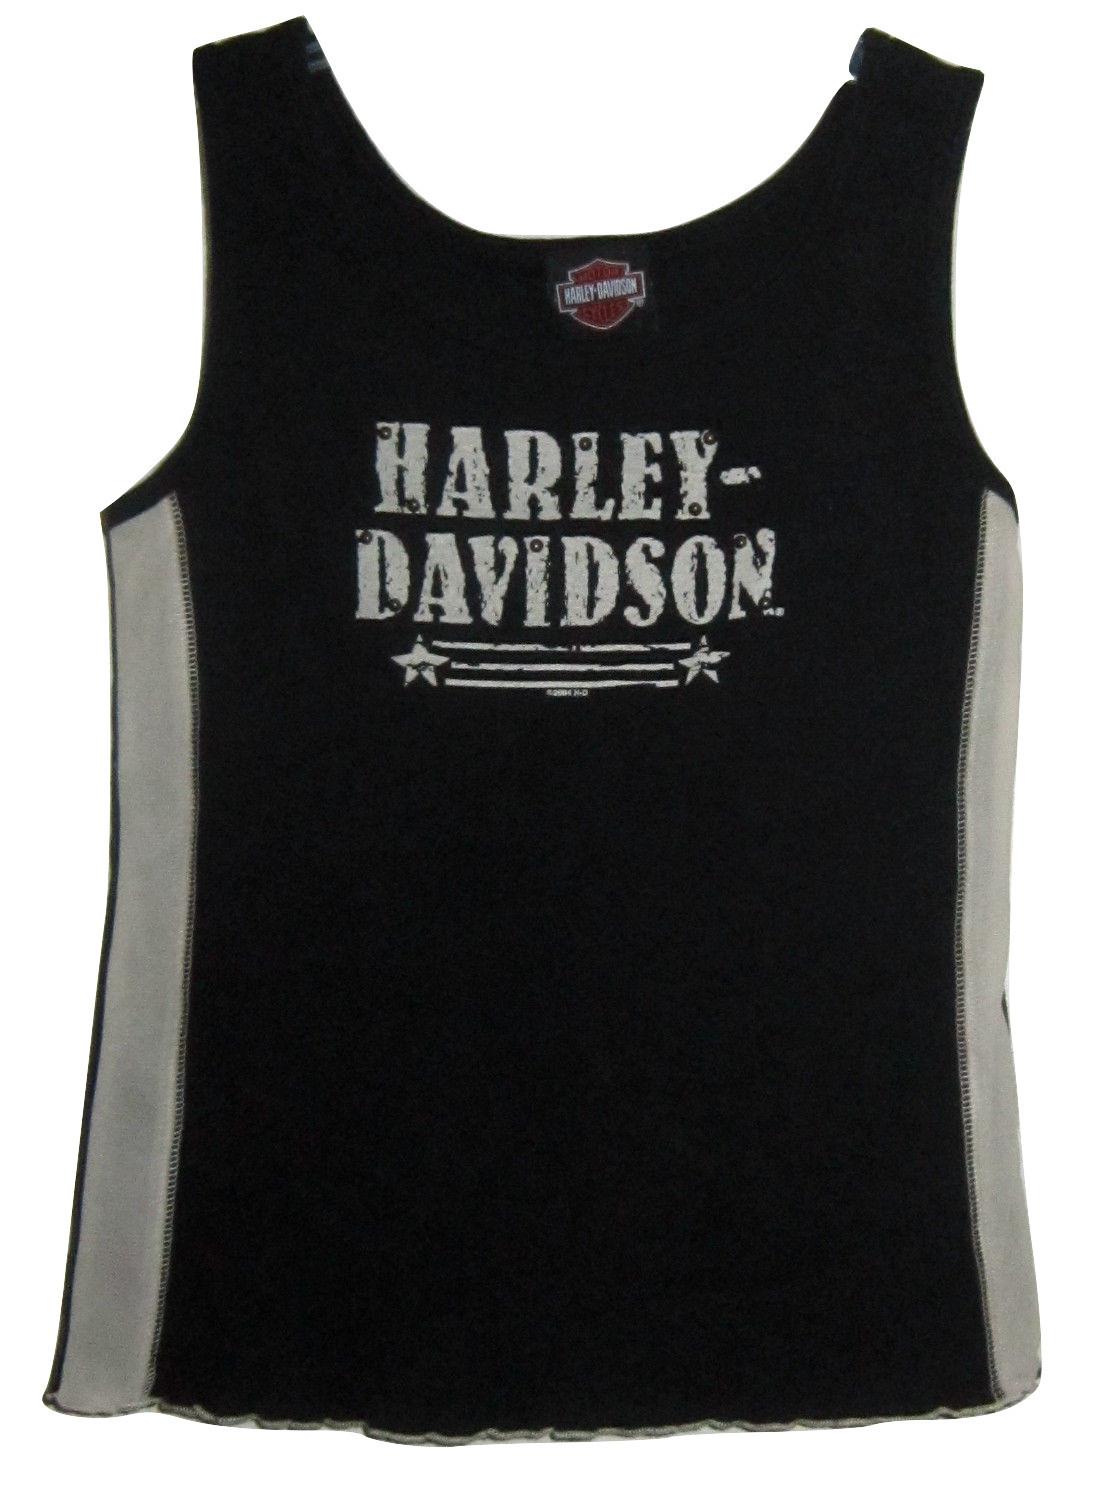 b5ae4730fd4 Img 2156429788 1515512805. Img 2156429788 1515512805. Previous. HARLEY  DAVIDSON CALIFORNIA SUPER CUTE WOMENS TANK TOP ...